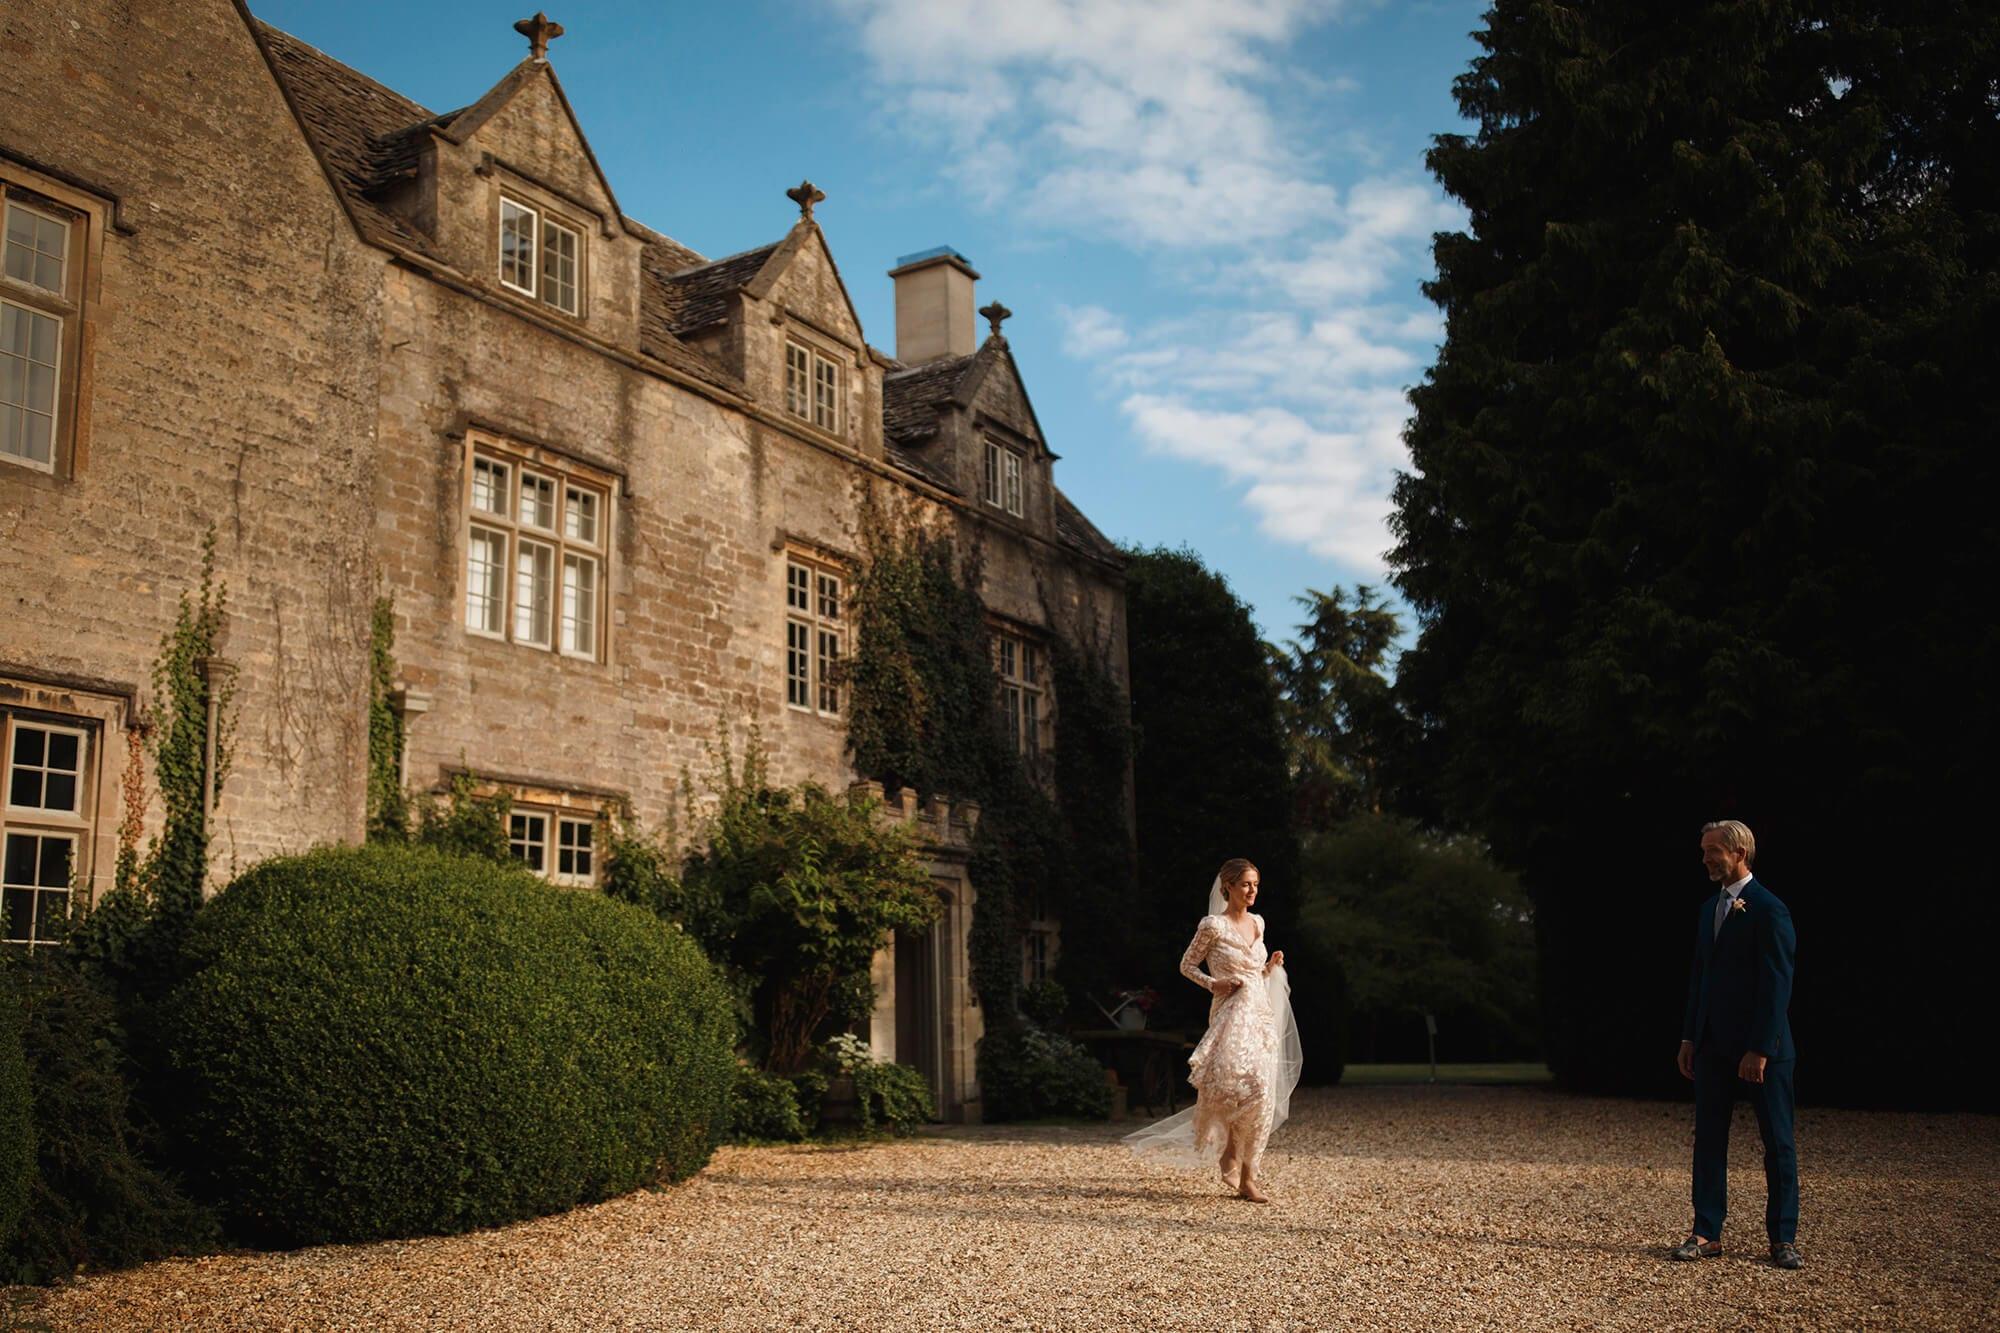 Wedding venues in Oxfordshire